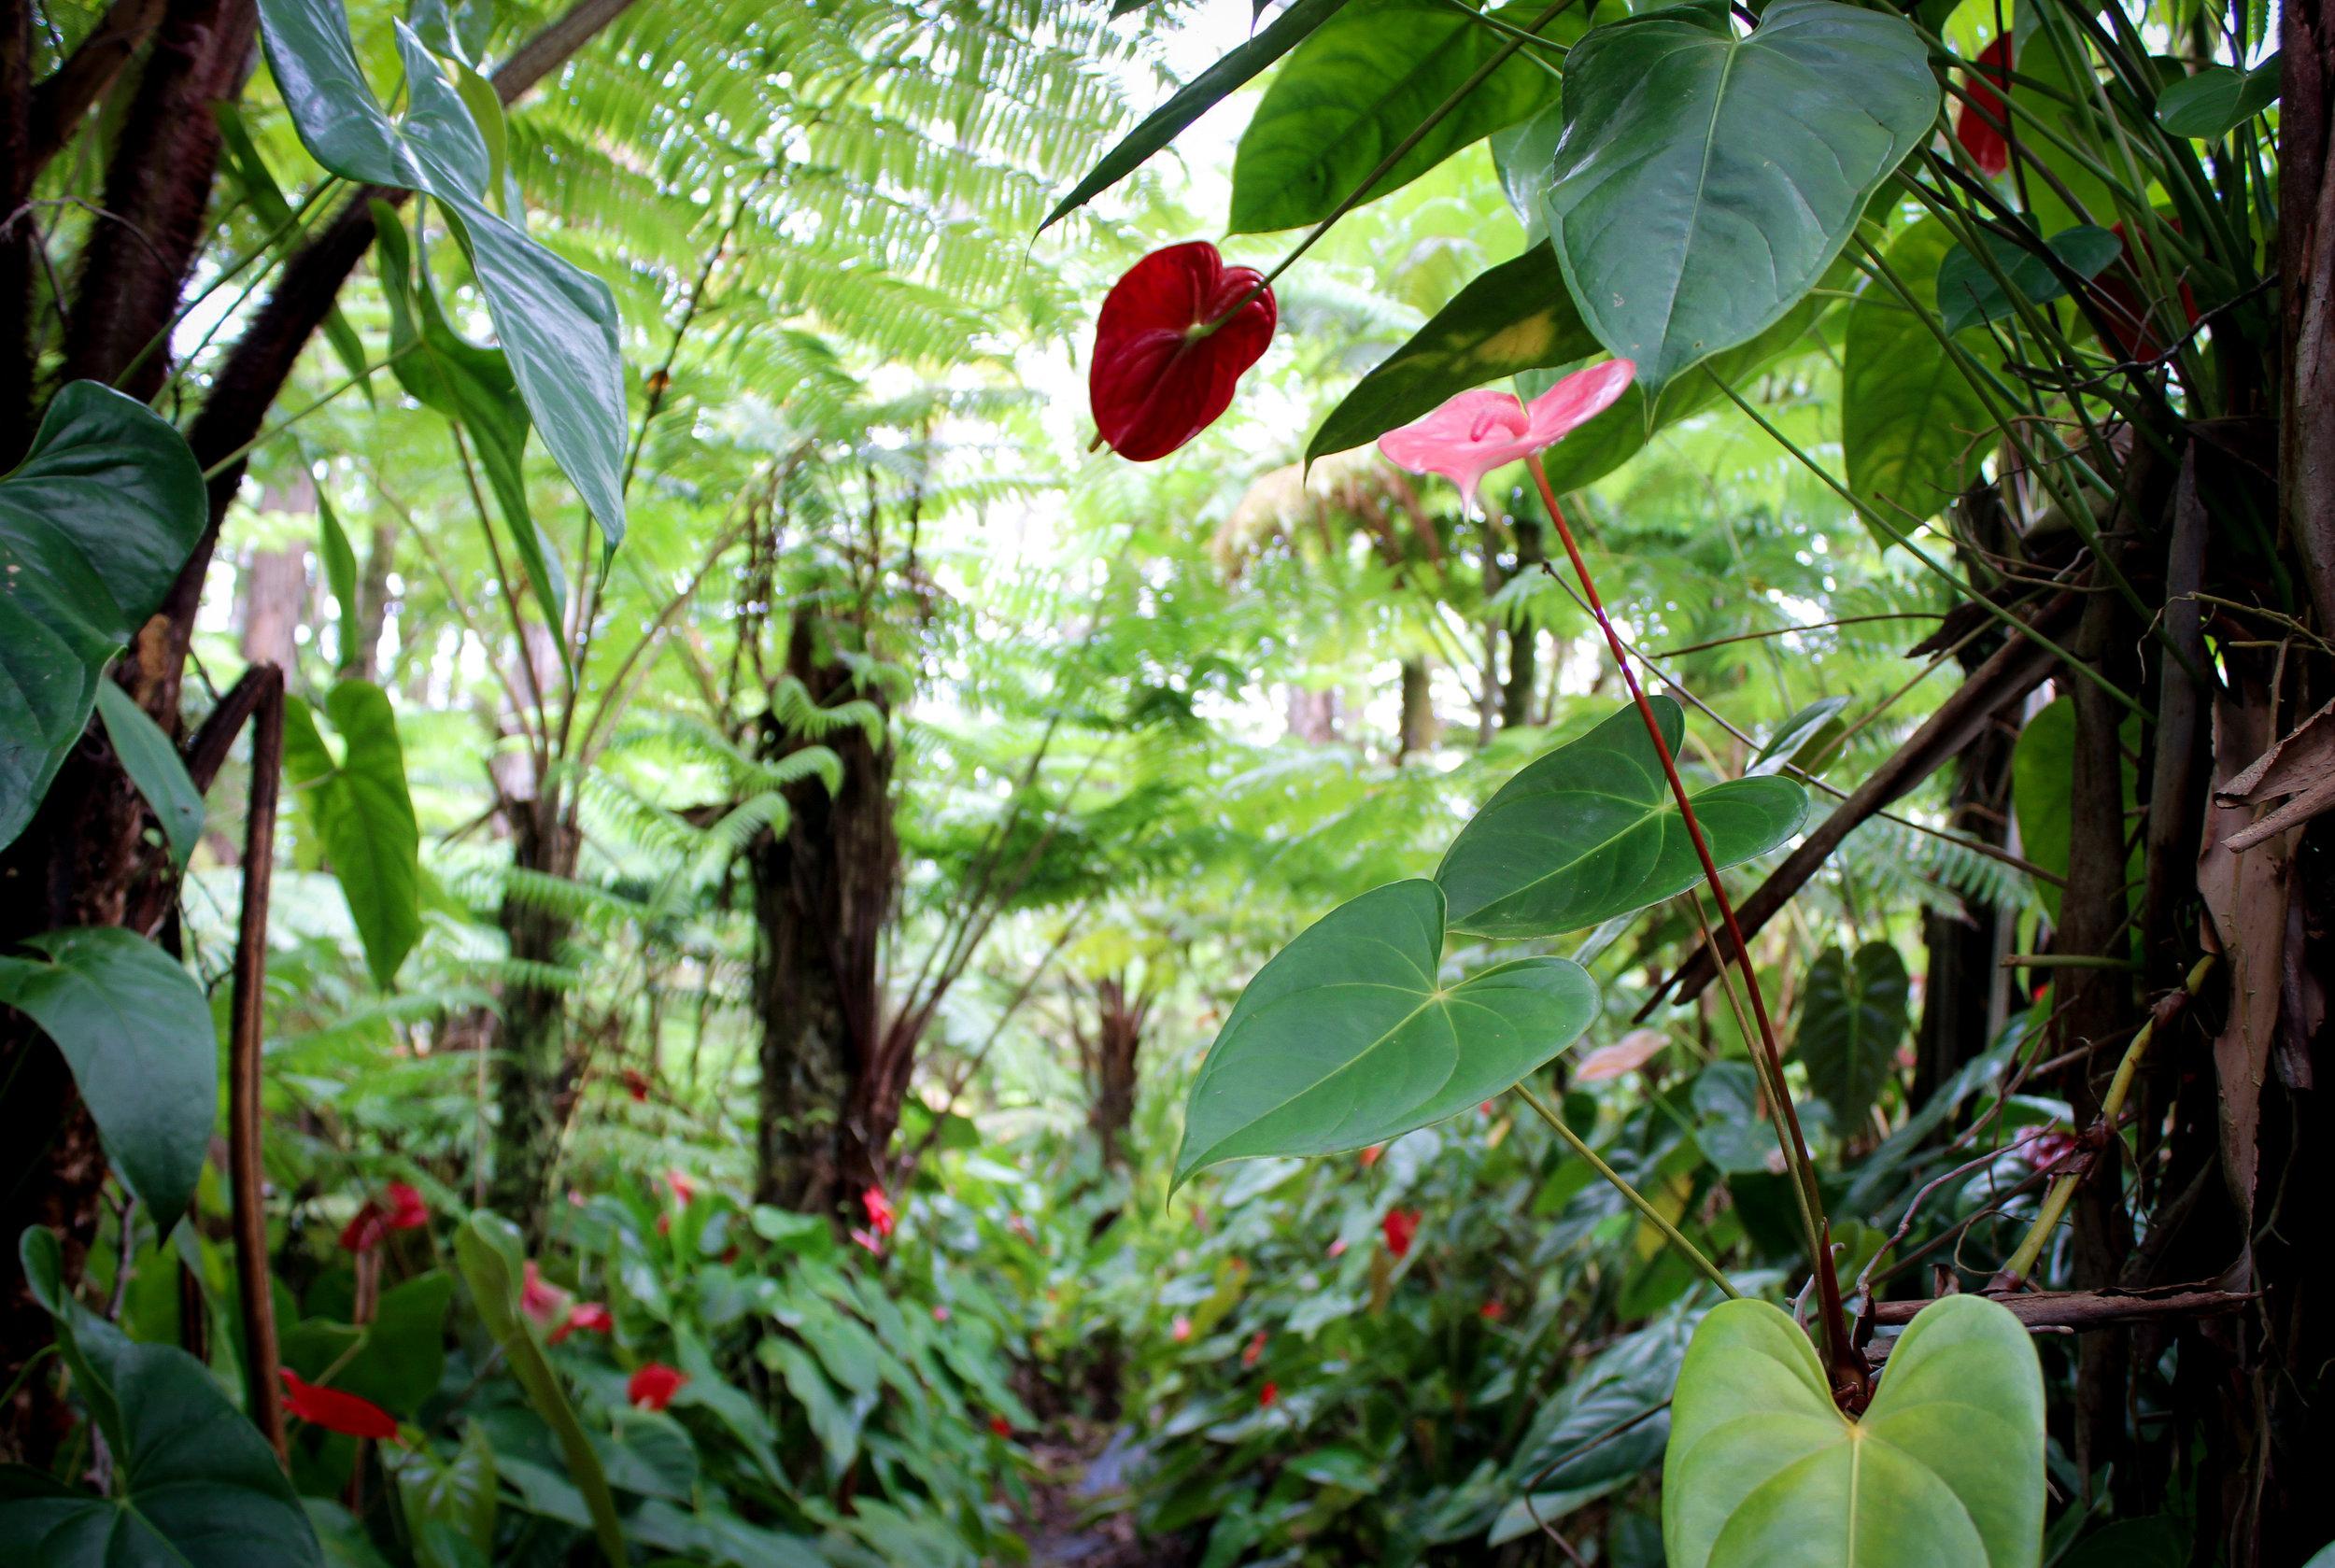 Anthurium Flower hawaii cut.jpg